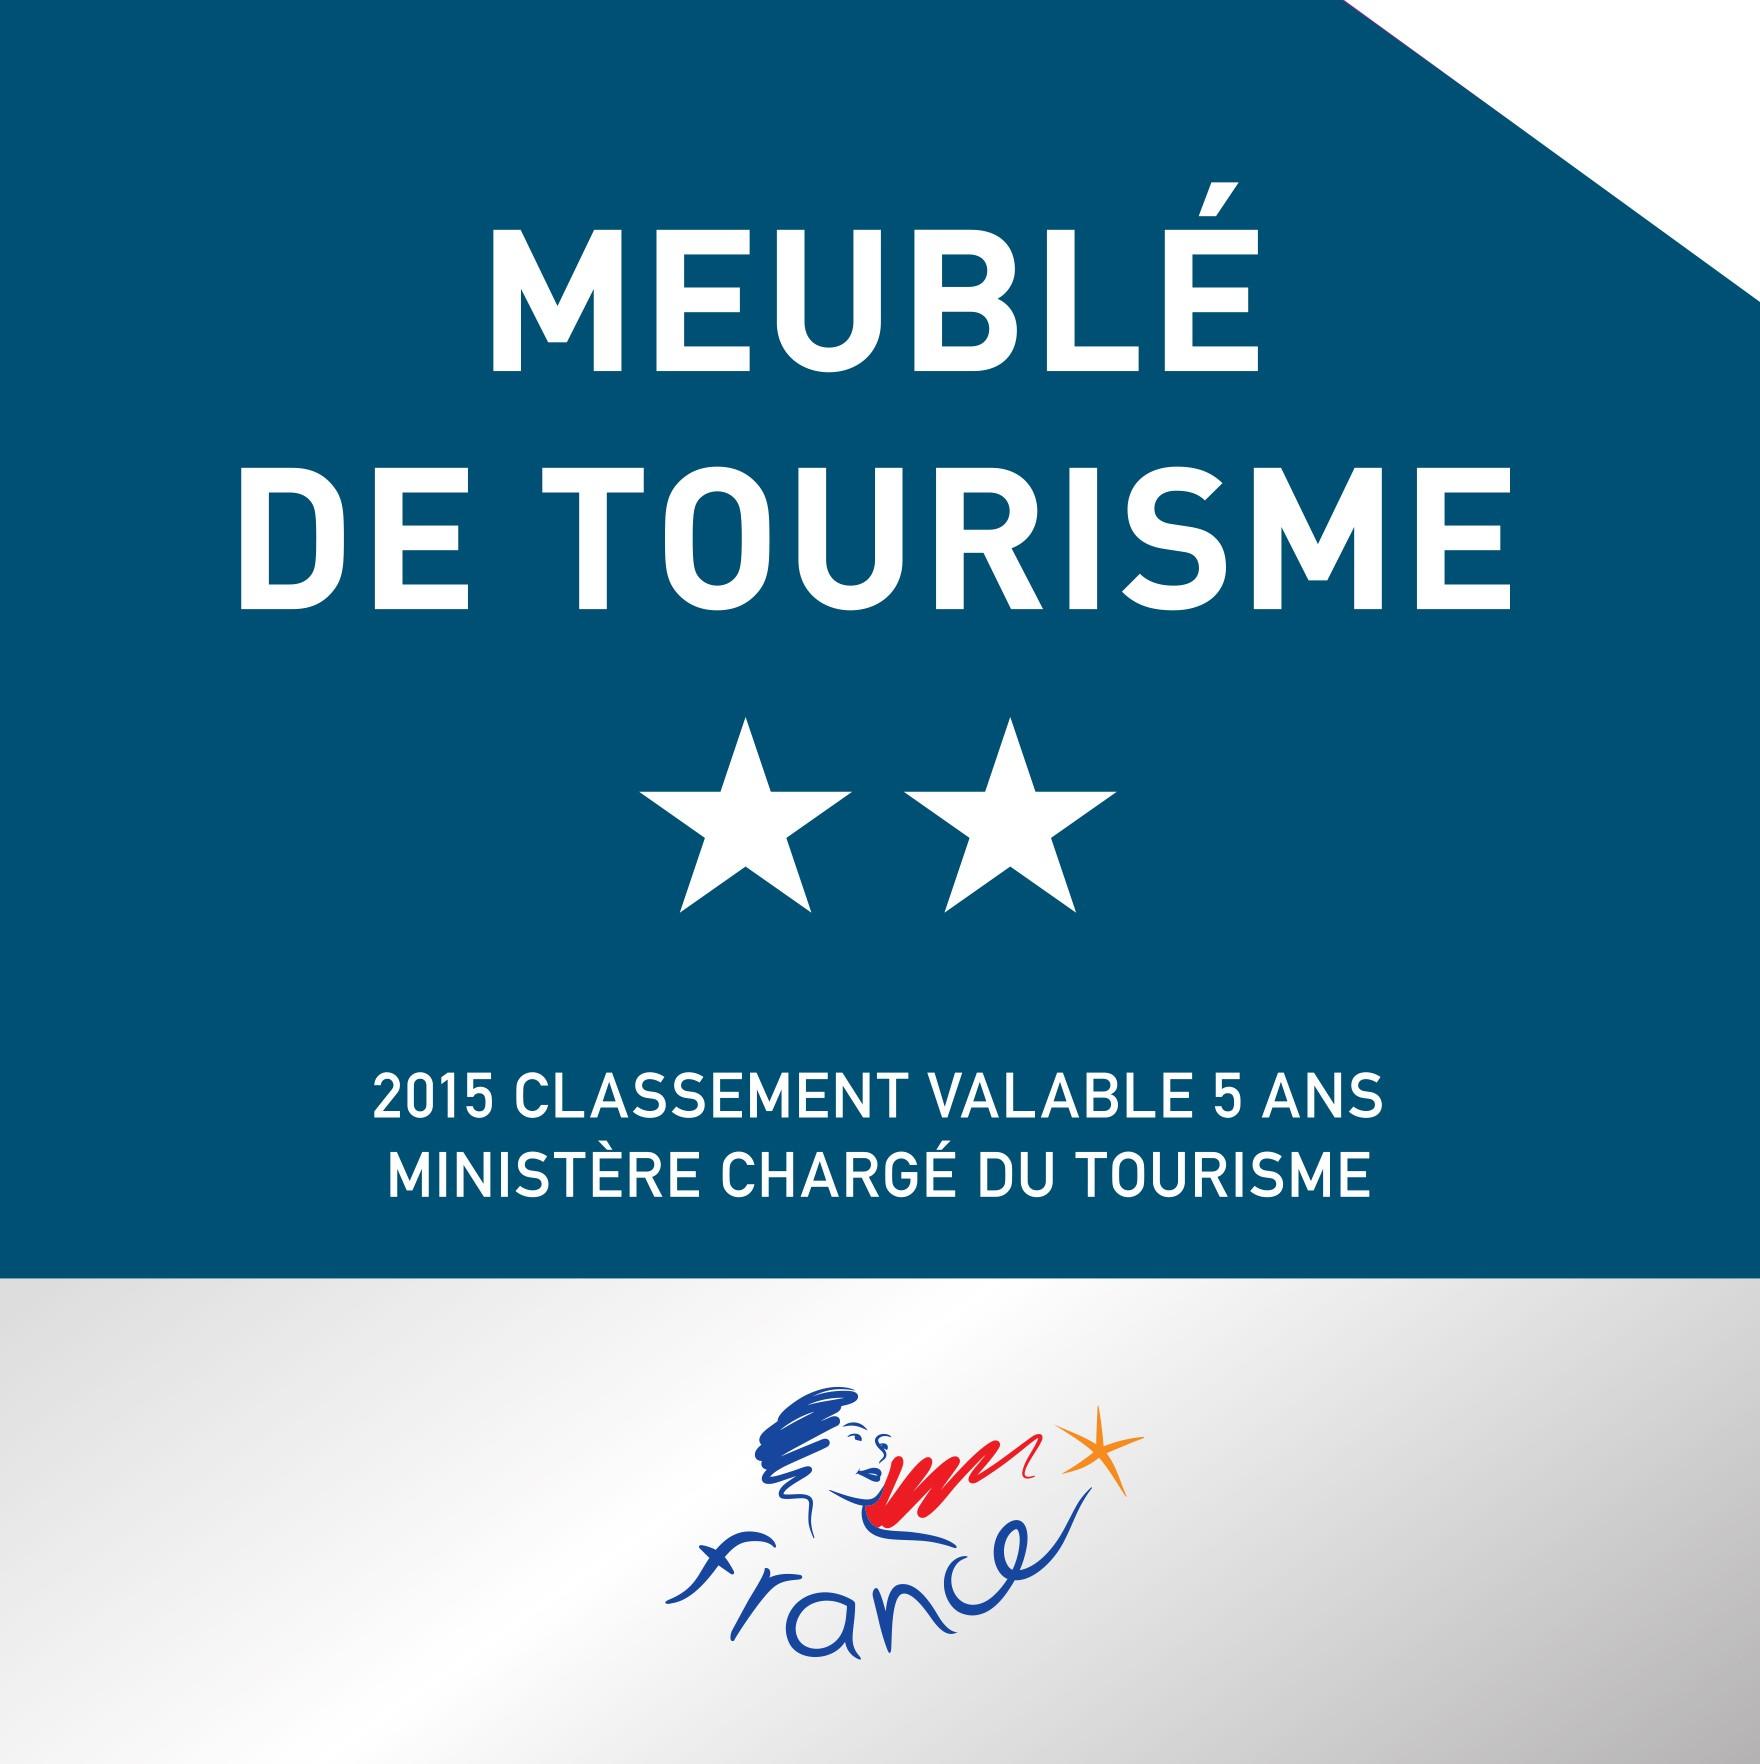 plaque-meuble-tourisme2-2015-11617